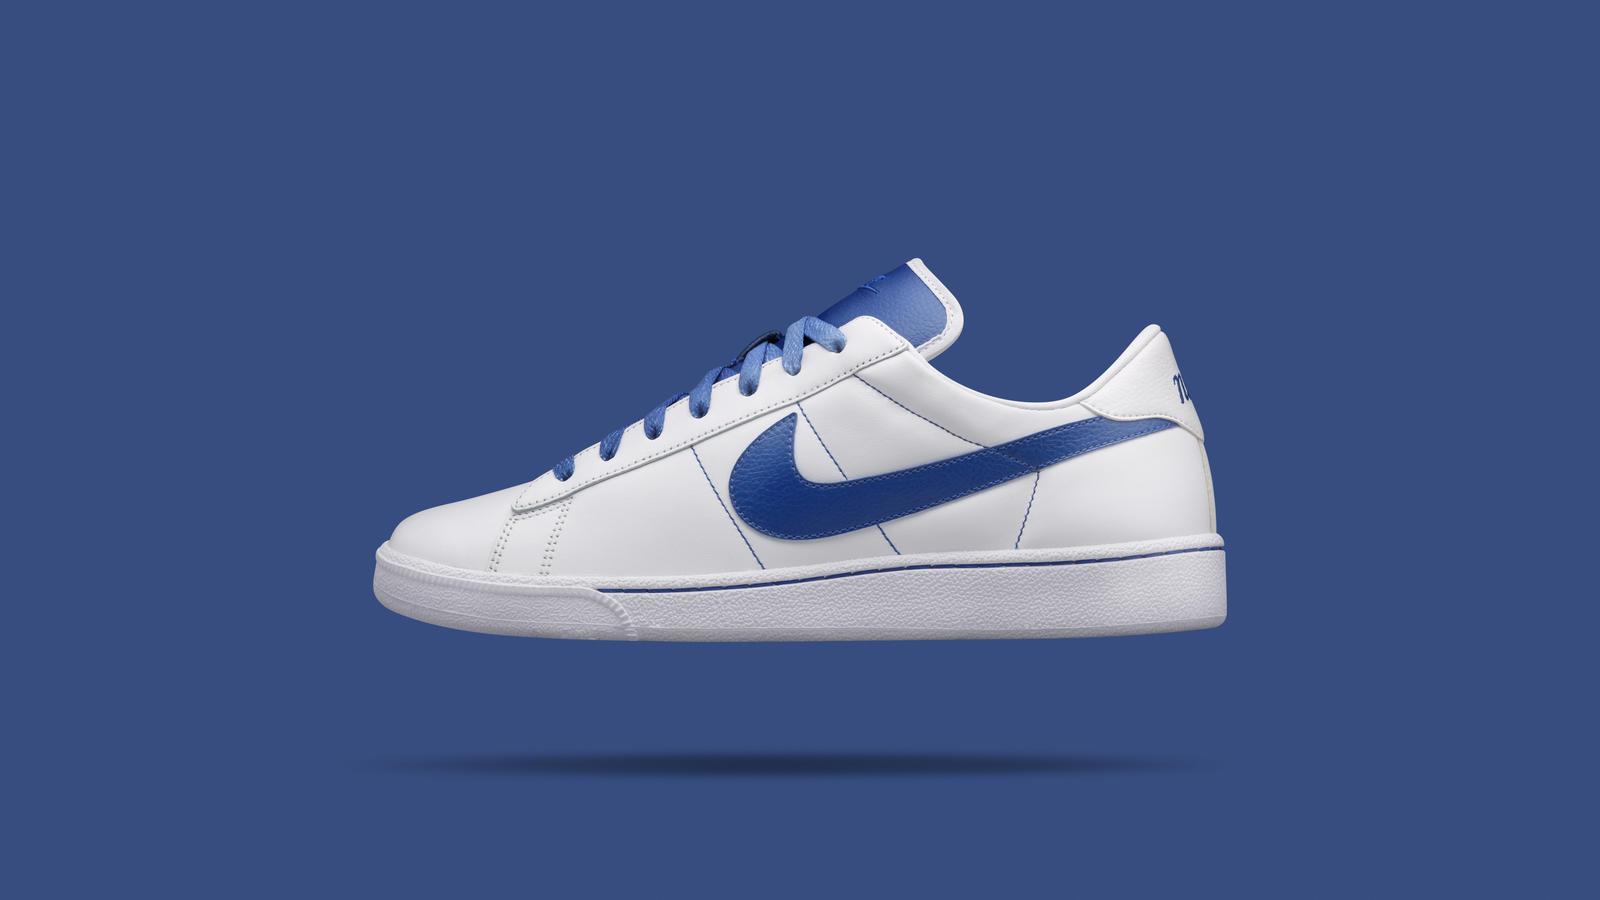 Top 5 Best Tennis Shoes 2016 - For Men